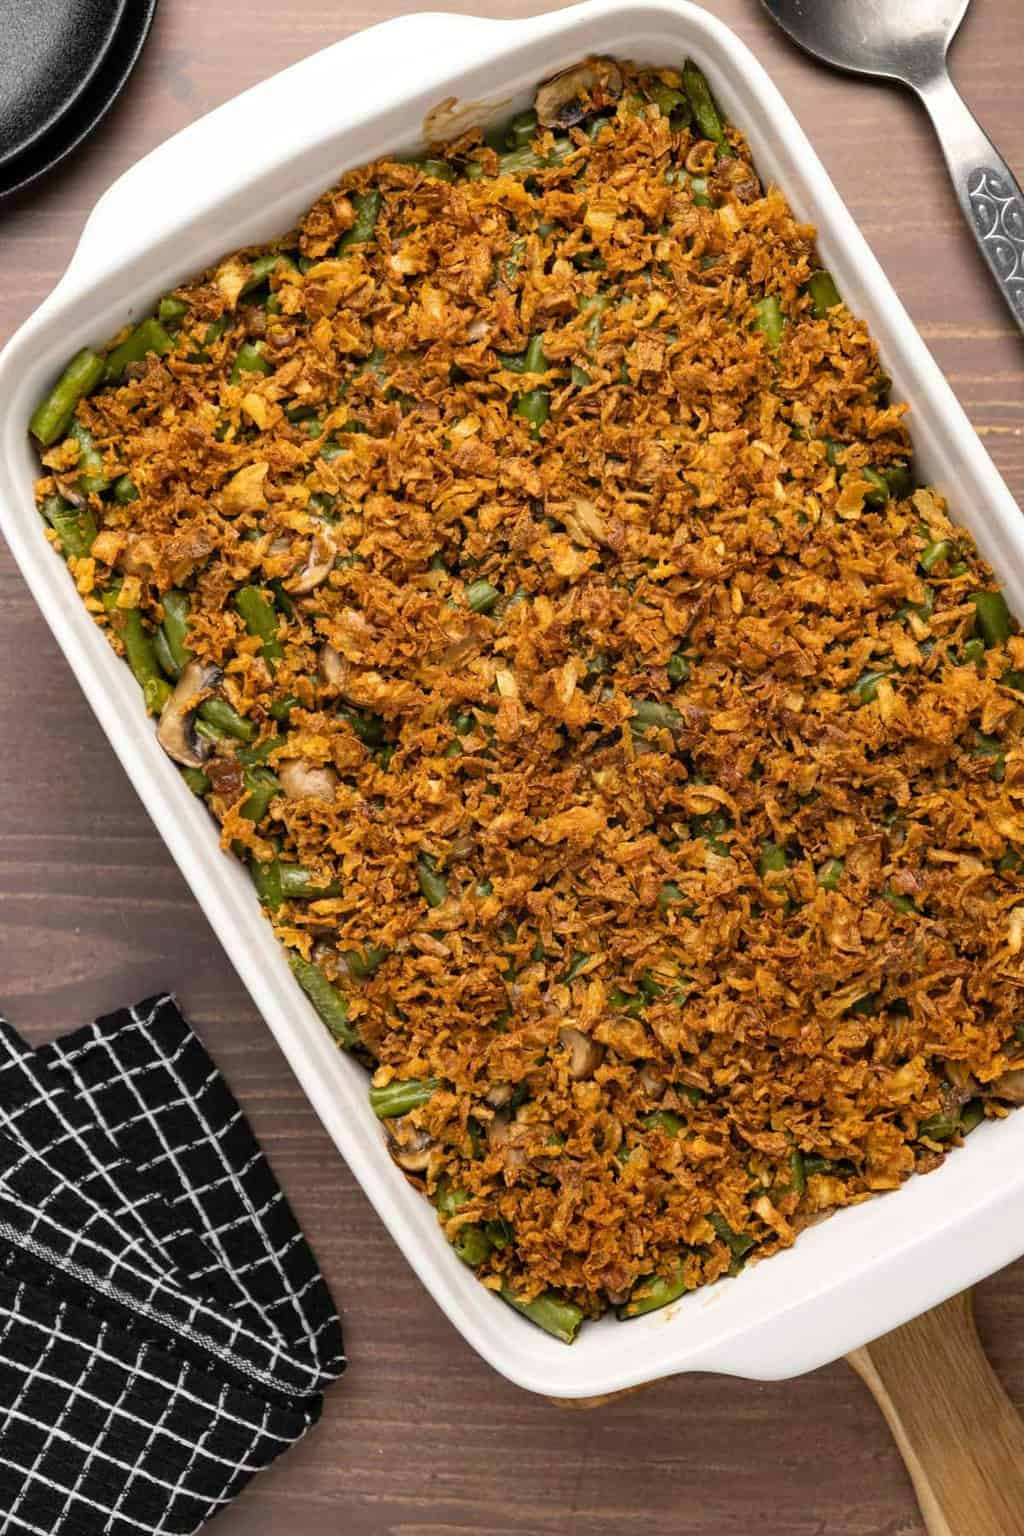 Vegan green bean casserole in a white dish.